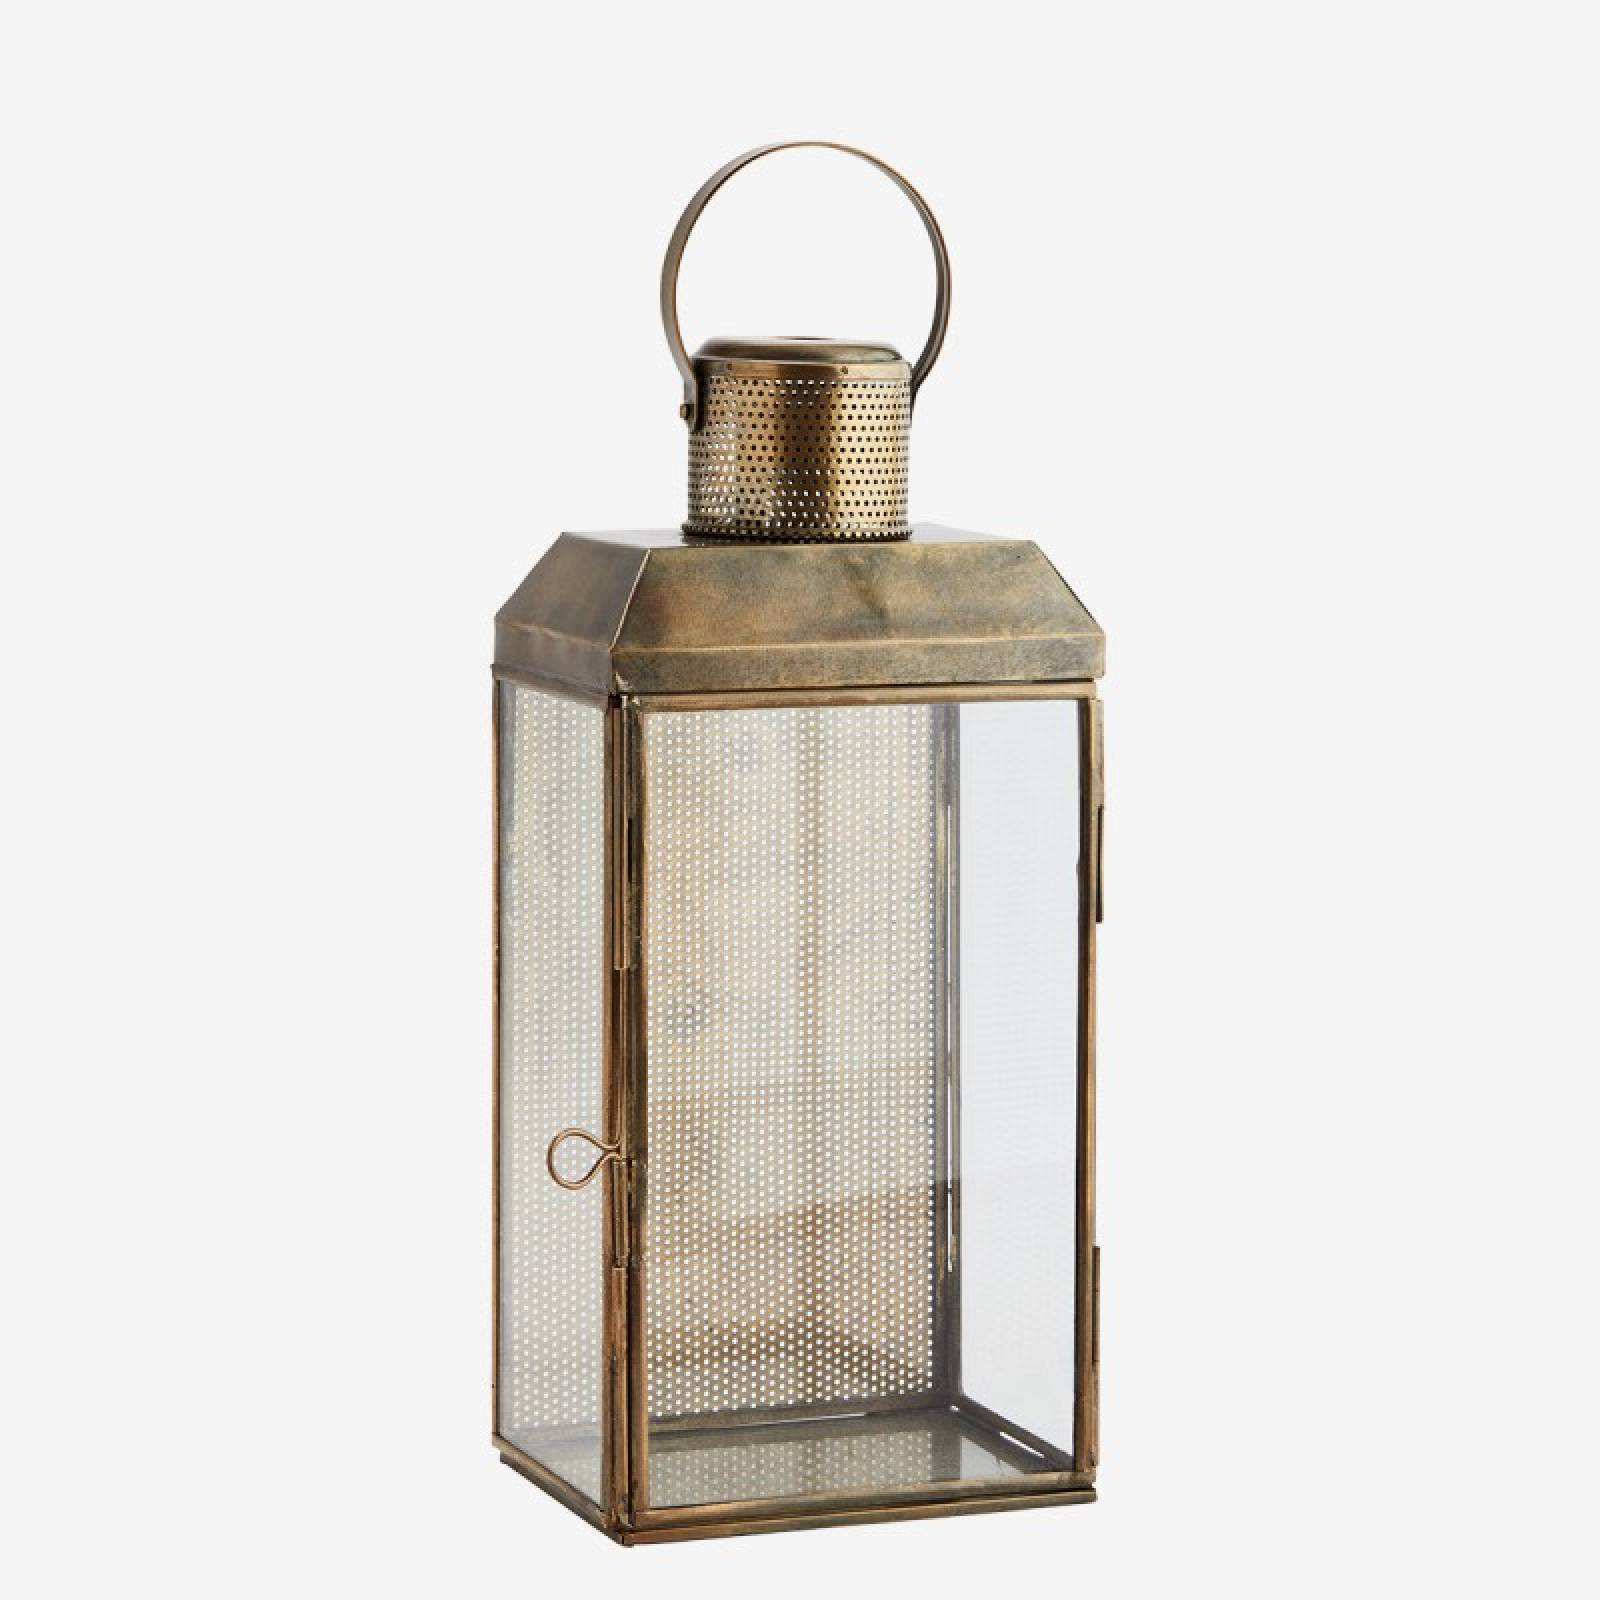 Wall lantern 13,5x10x30 cm Iron, glass - Aged ant.brass, clear